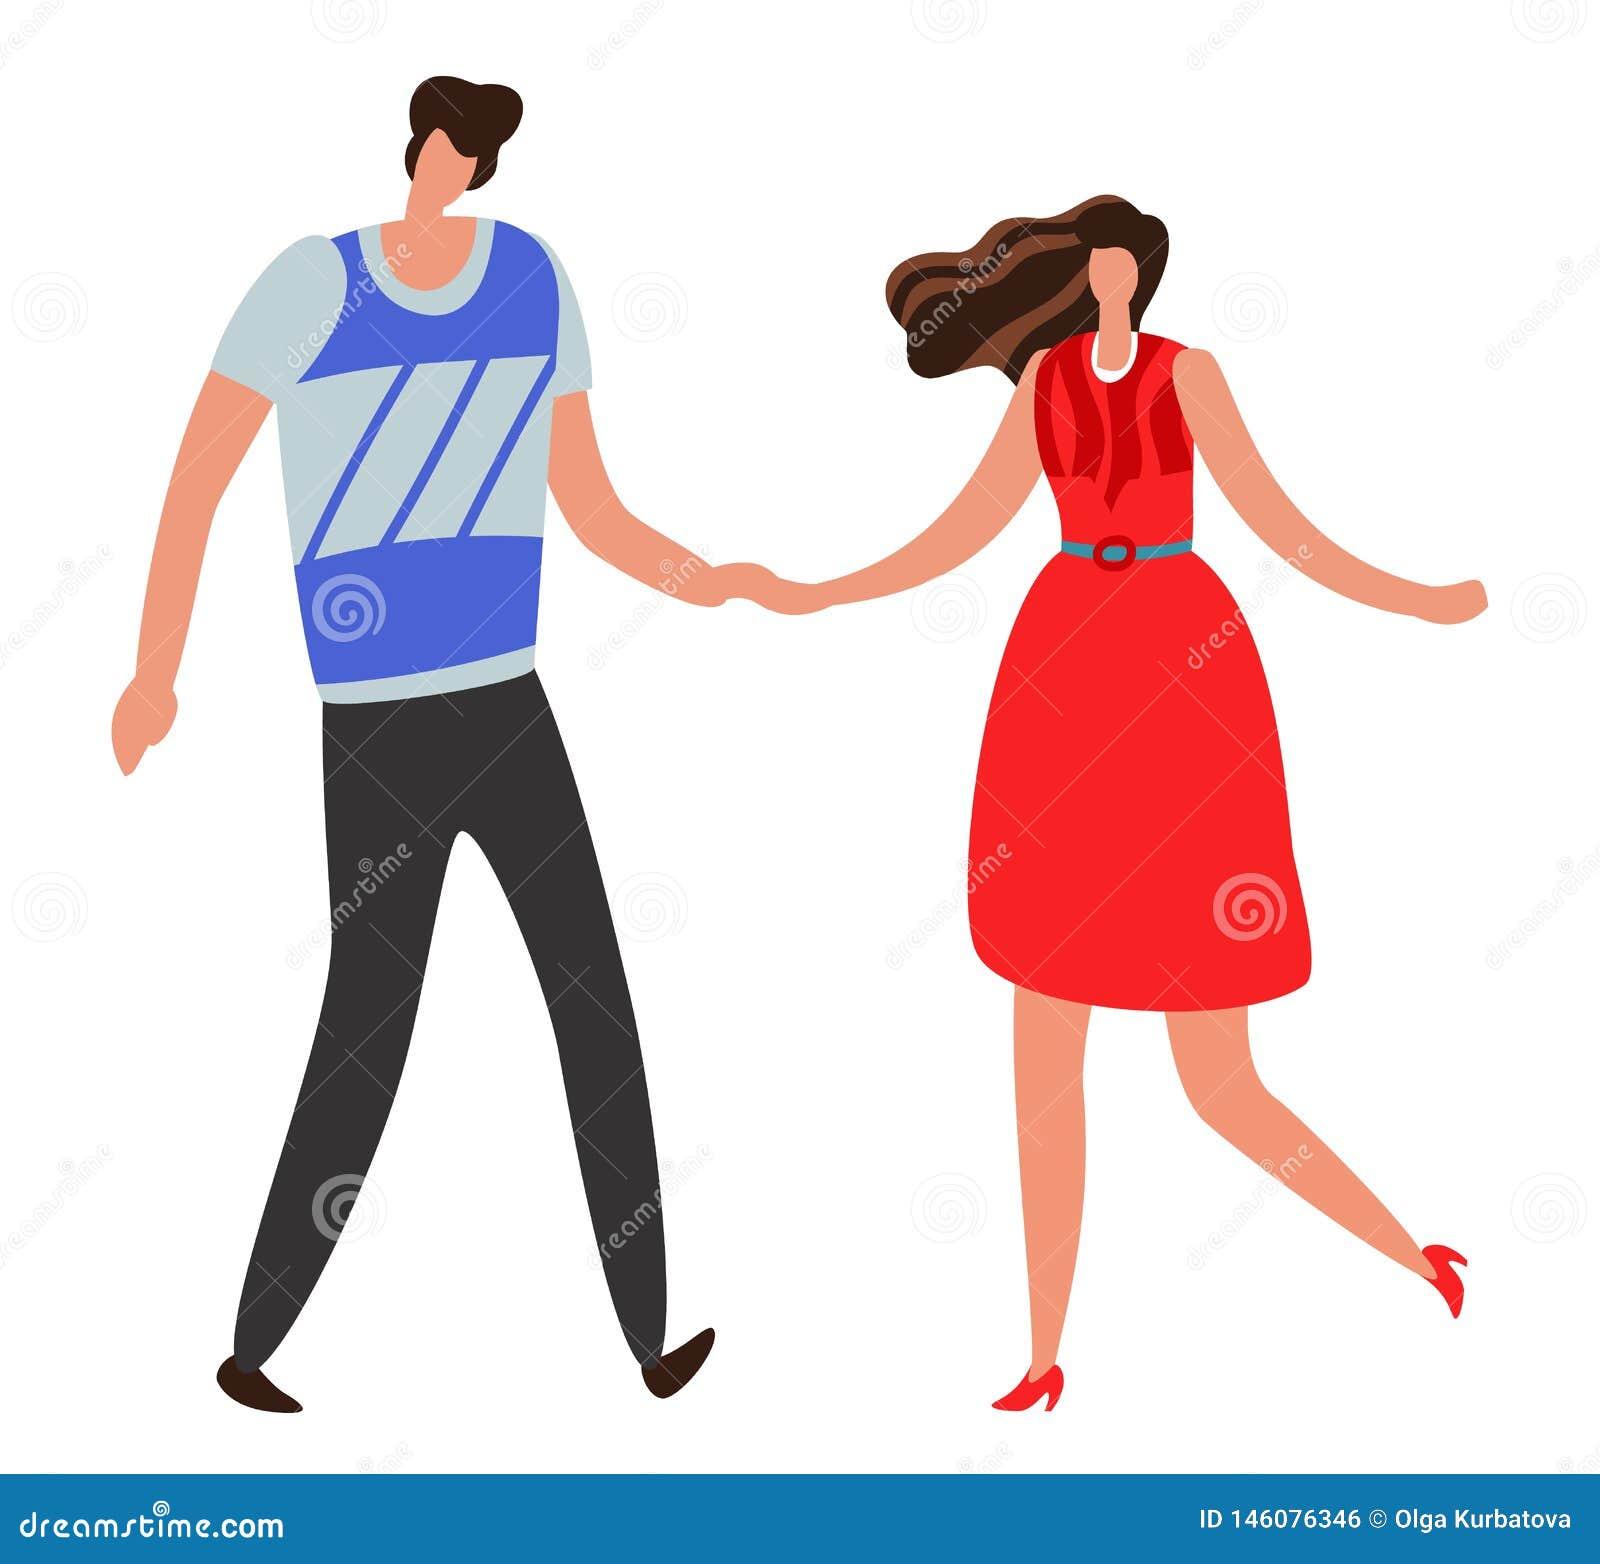 Girlfriend Pares novos e romântico bonitos, menino e menina junto Conceito feliz do vetor do relacionamento